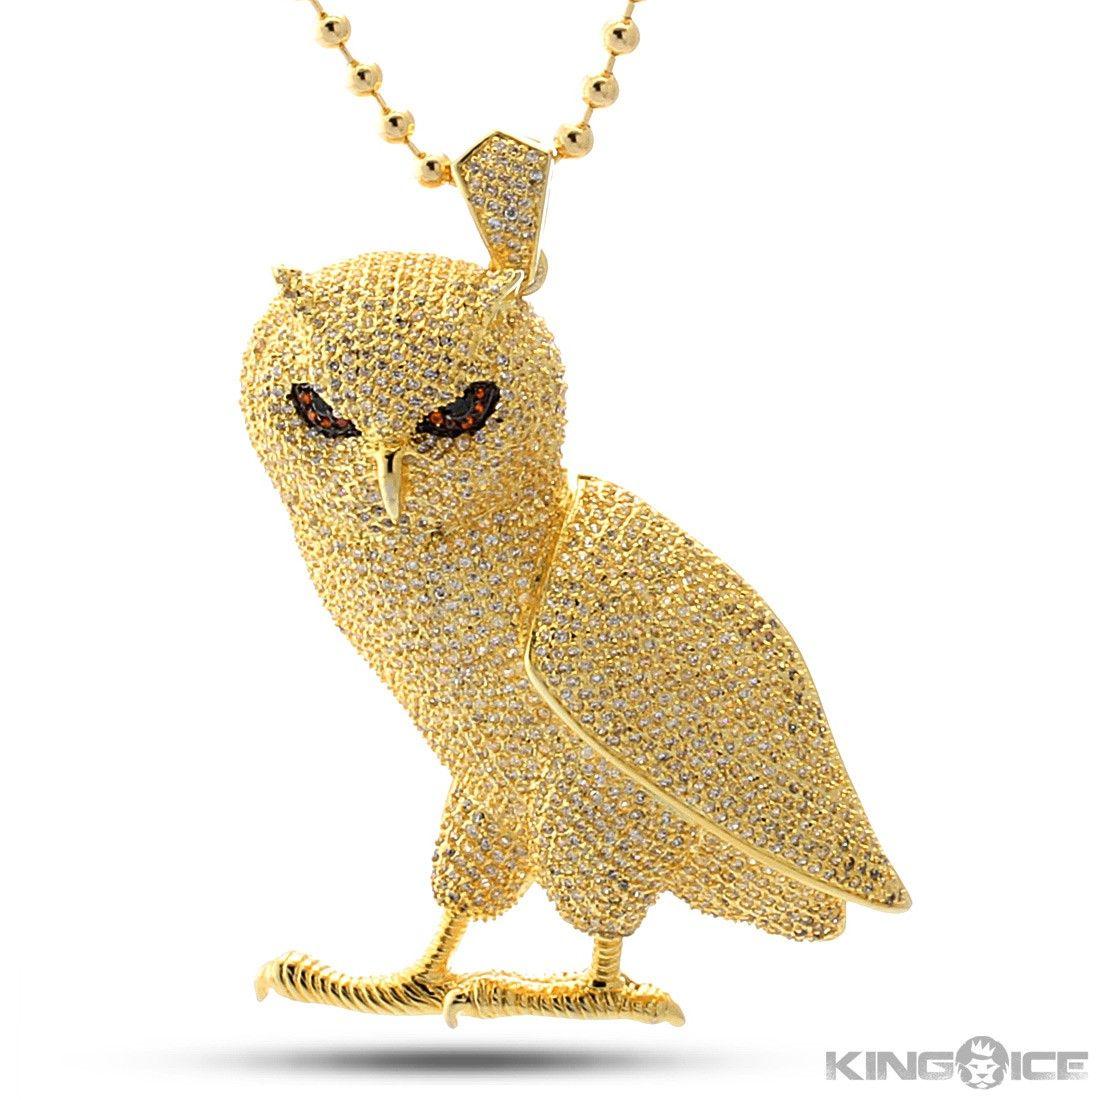 King Ice Gold Cz Owl Pendant  Hip Hop Ovo Jewelry  Urban Style